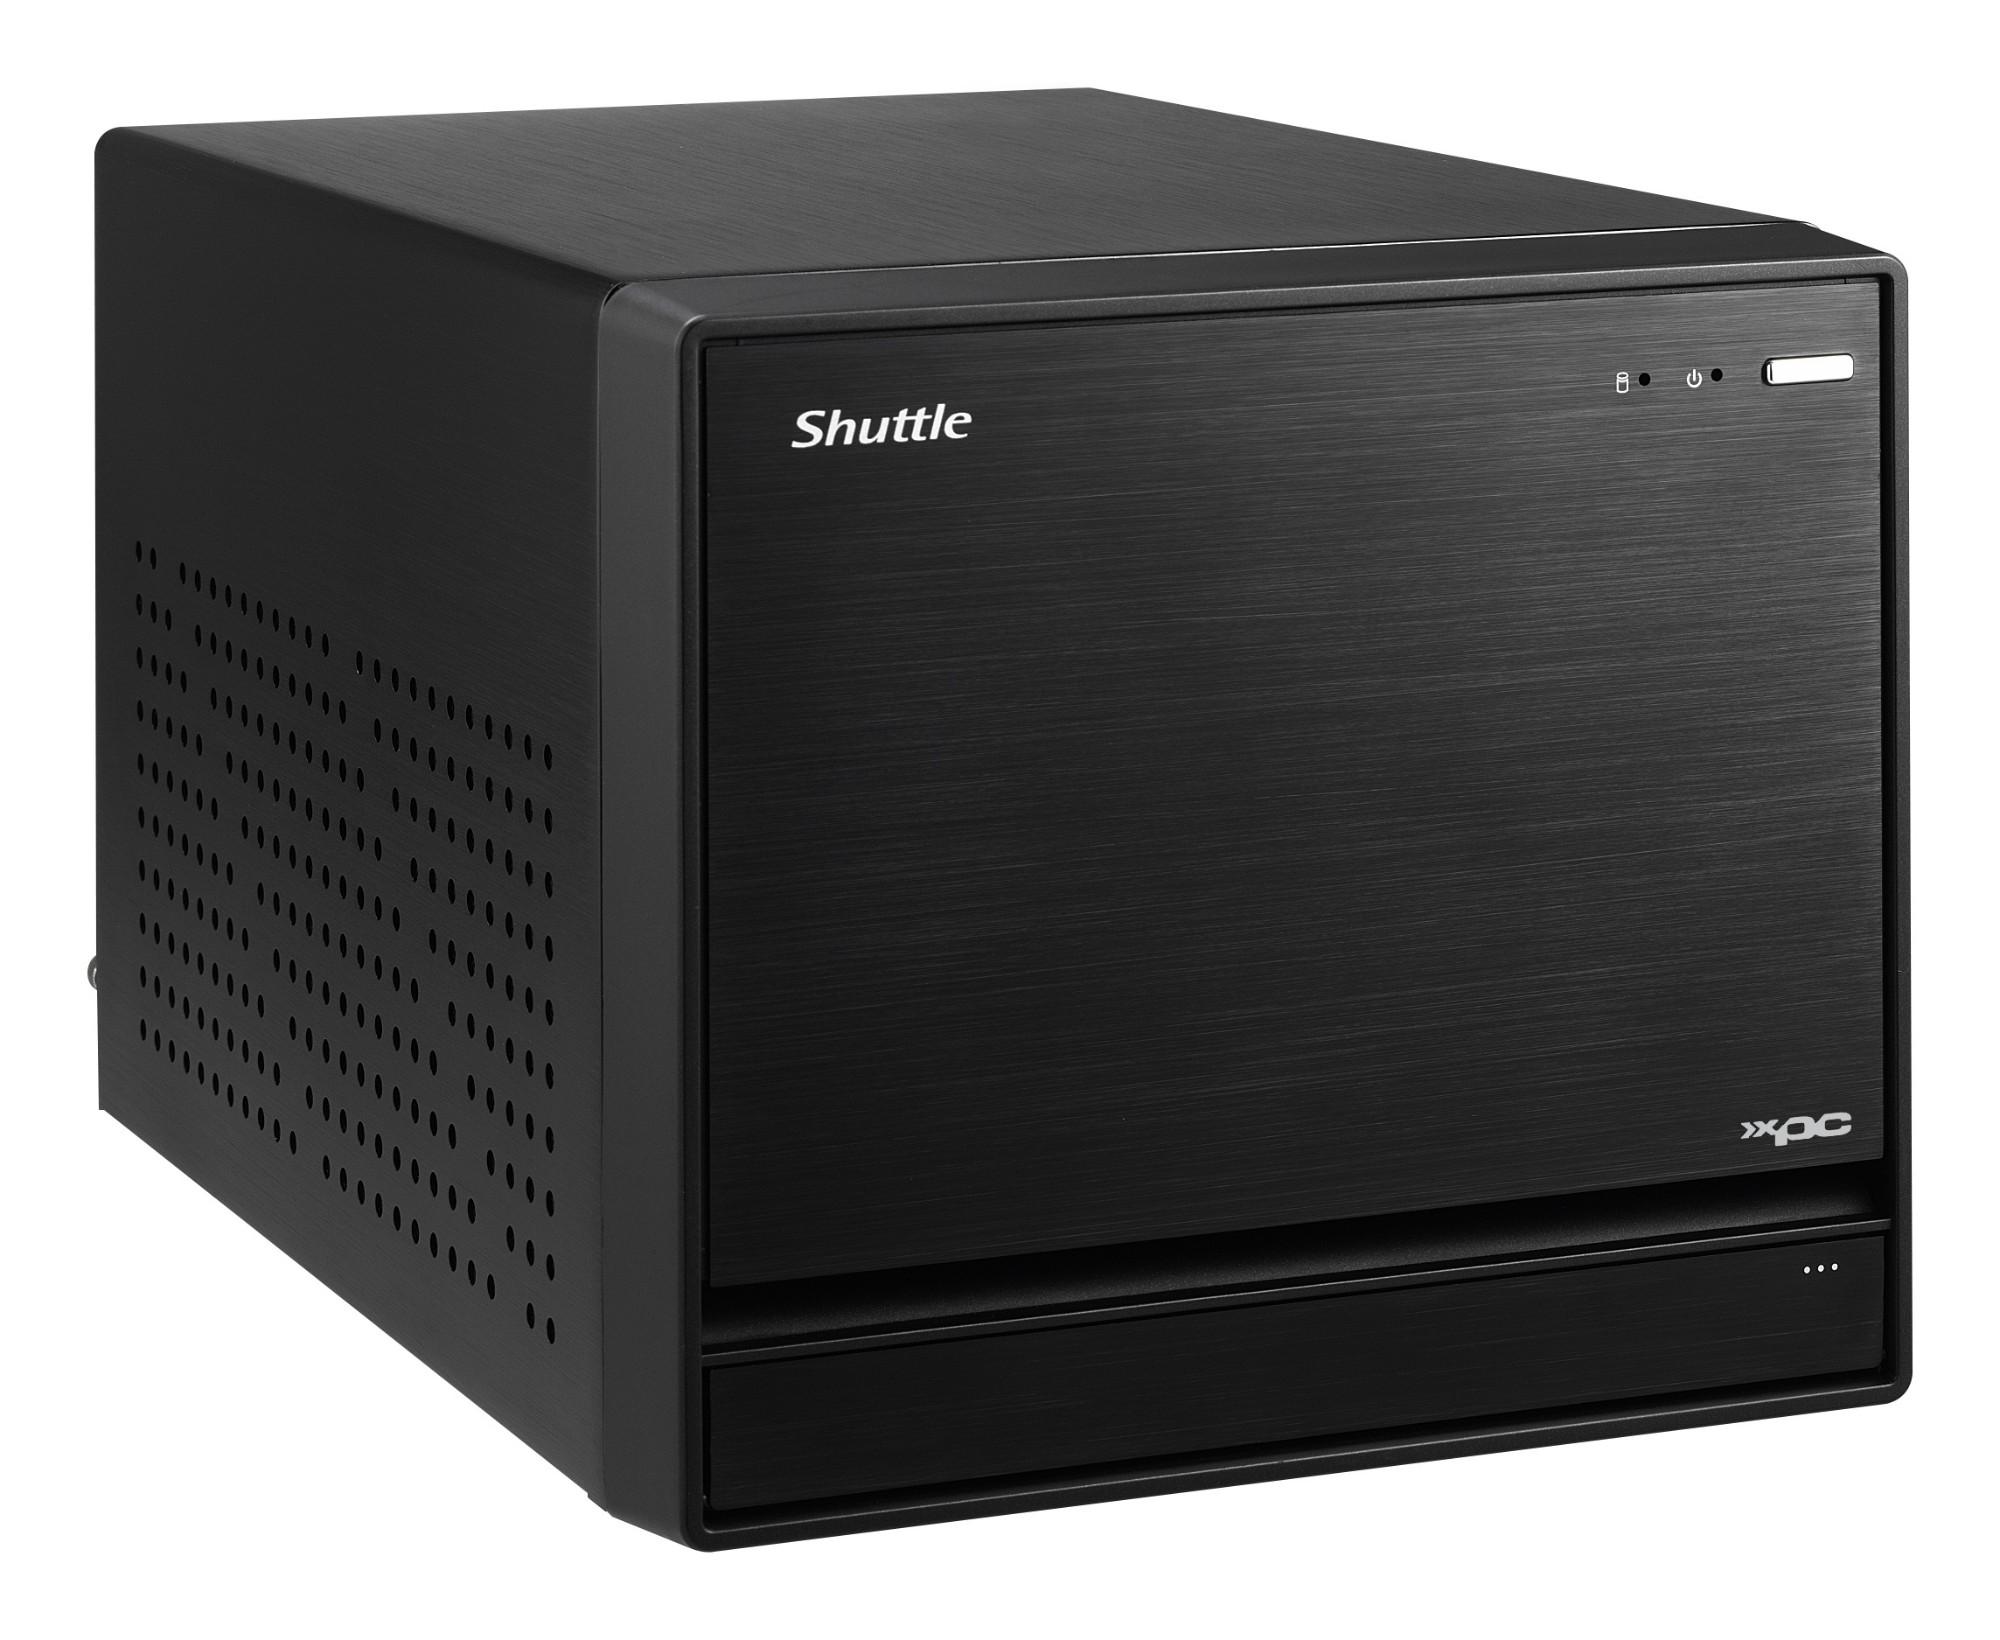 Shuttle XPC cube SZ270R8 Intel Z270 LGA 1151 (Socket H4) Cube Black PC/workstation barebone